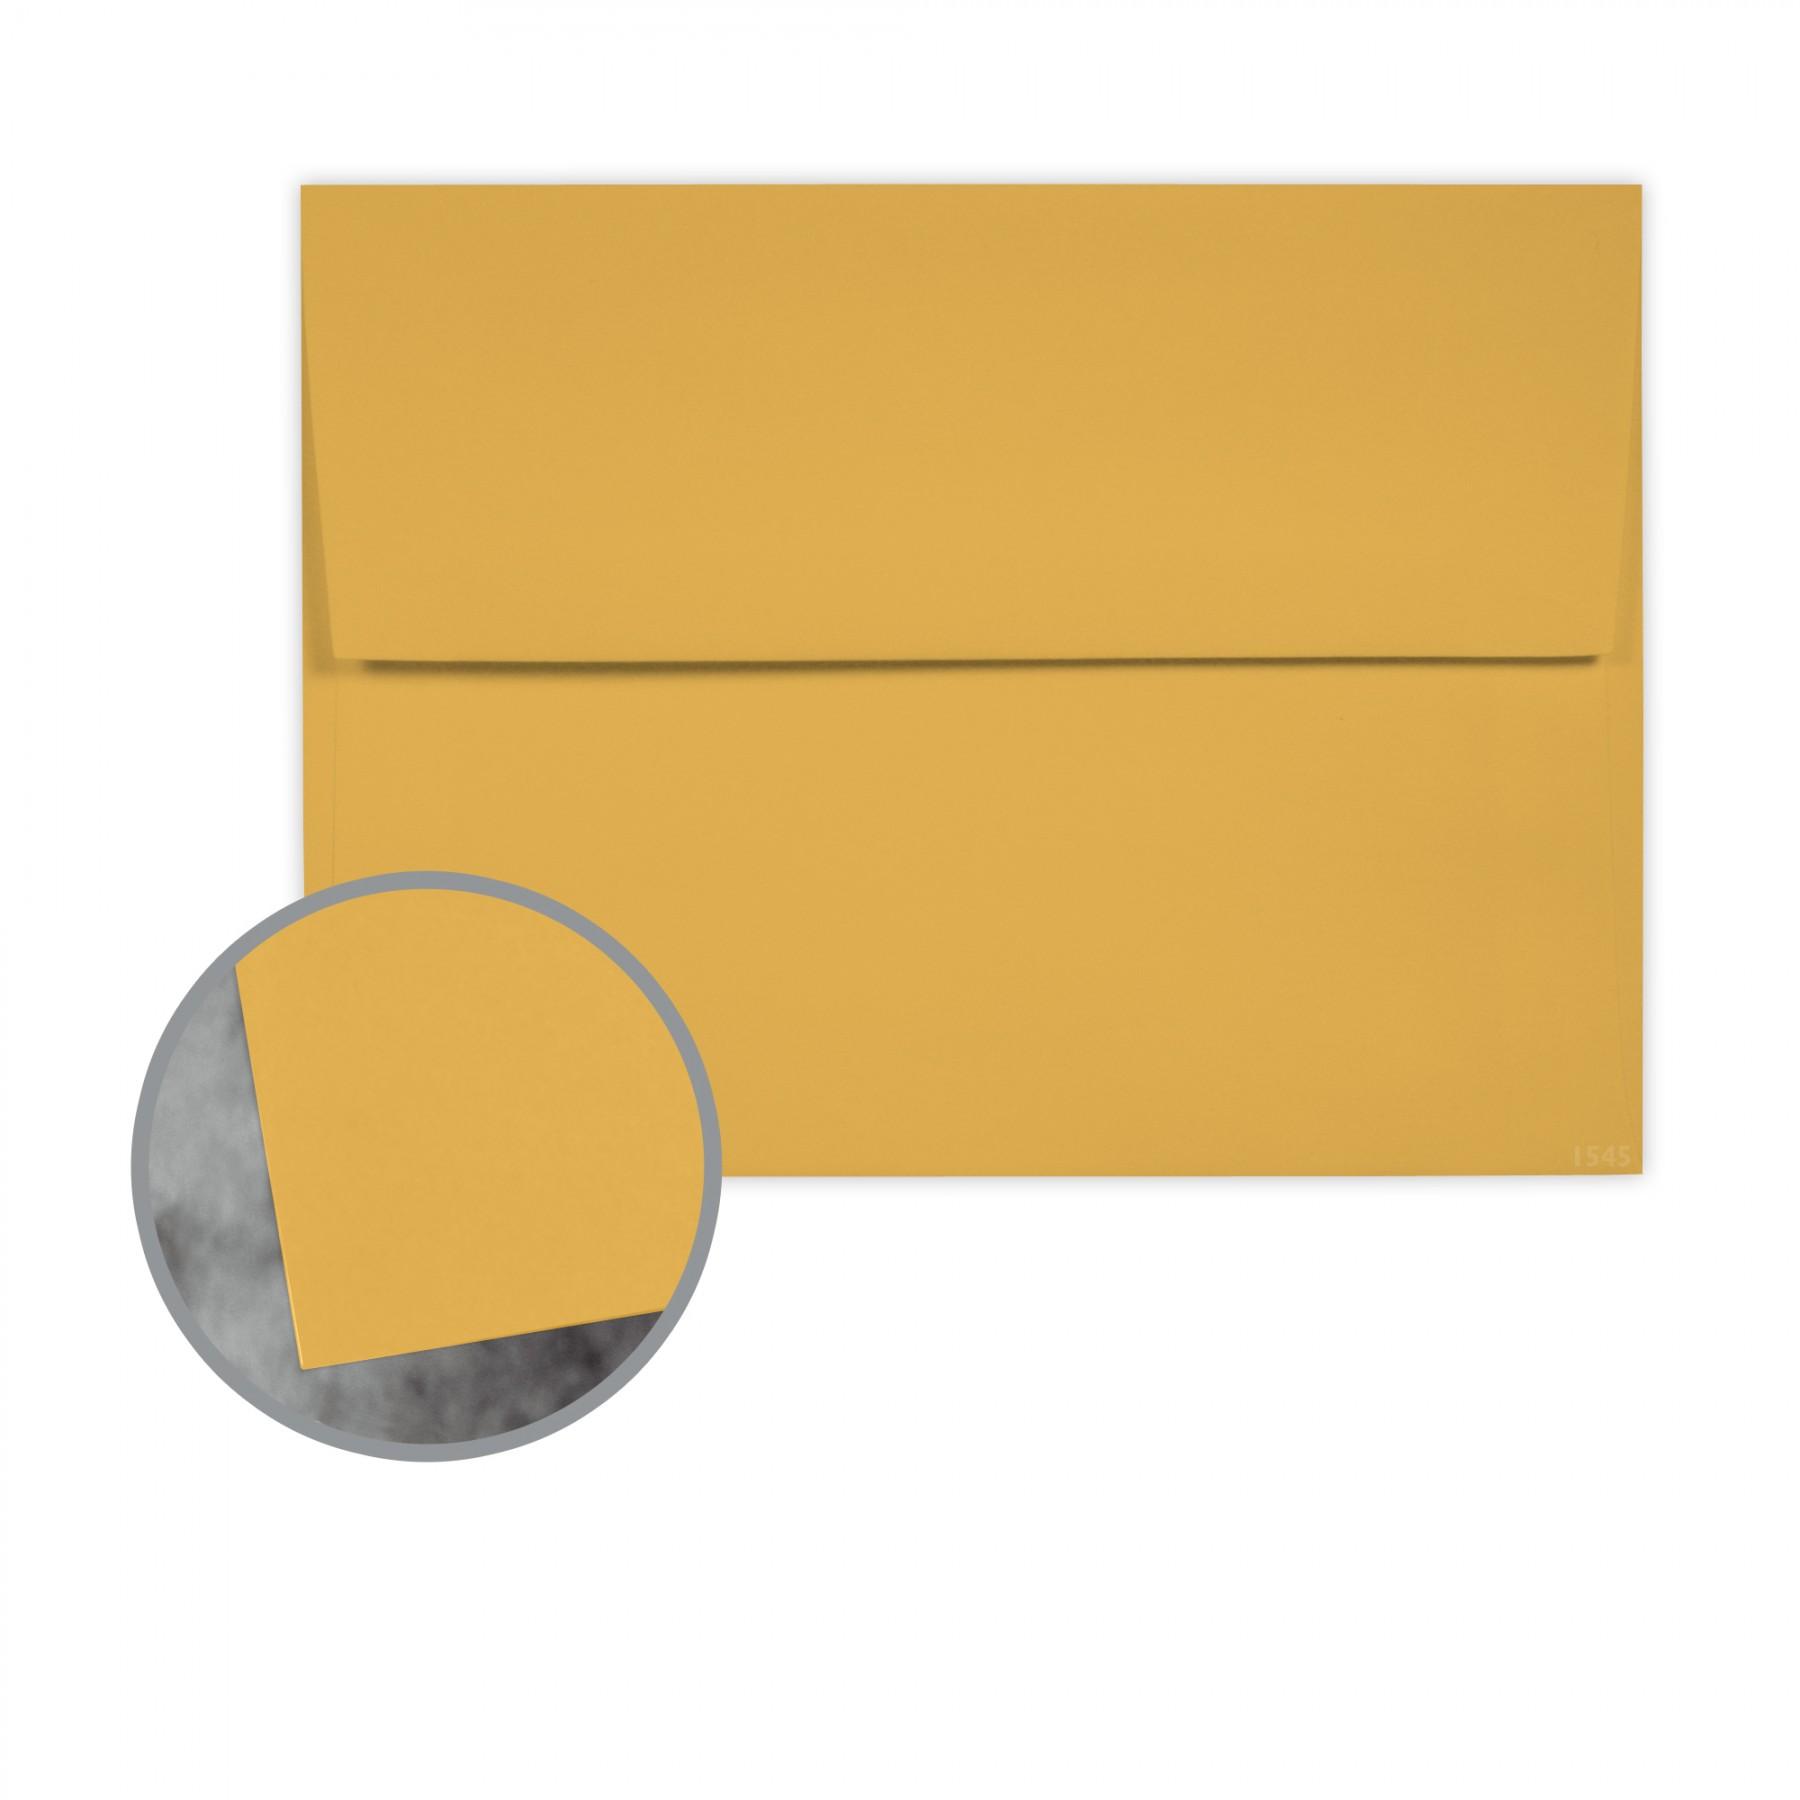 manila envelope sizes